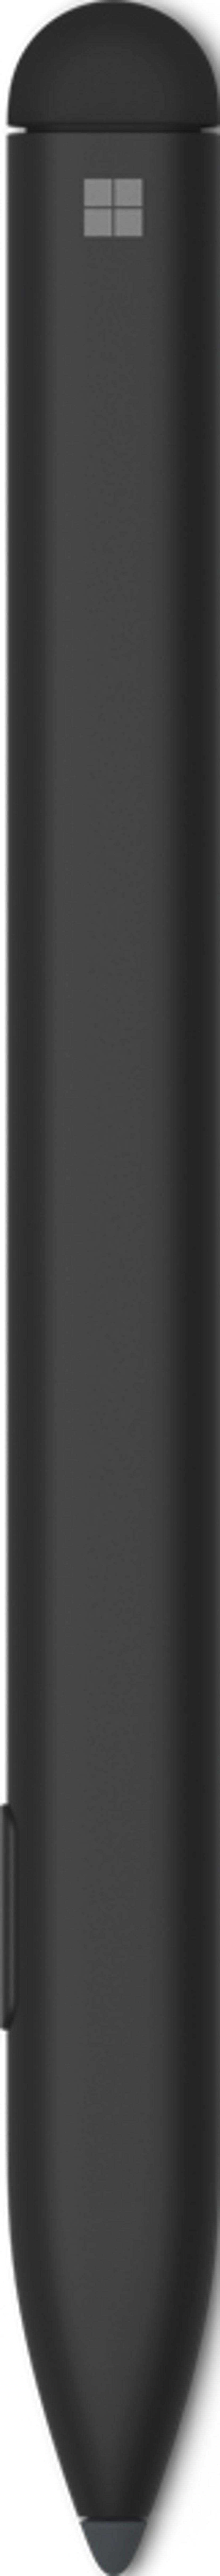 Microsoft Surface Slim Pen